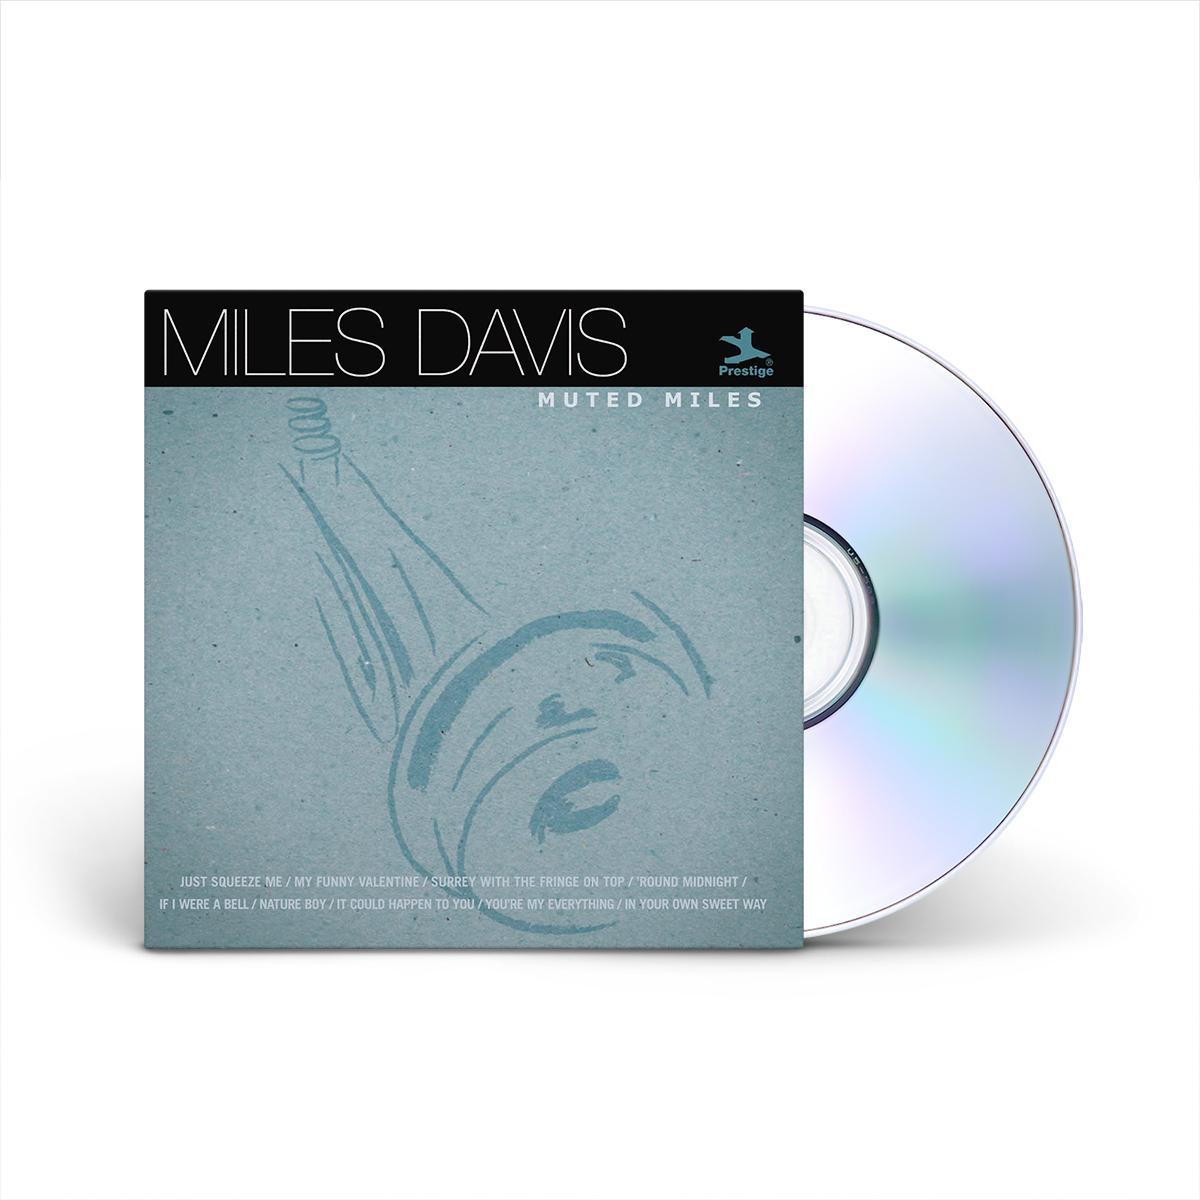 Miles Davis - Muted Miles CD